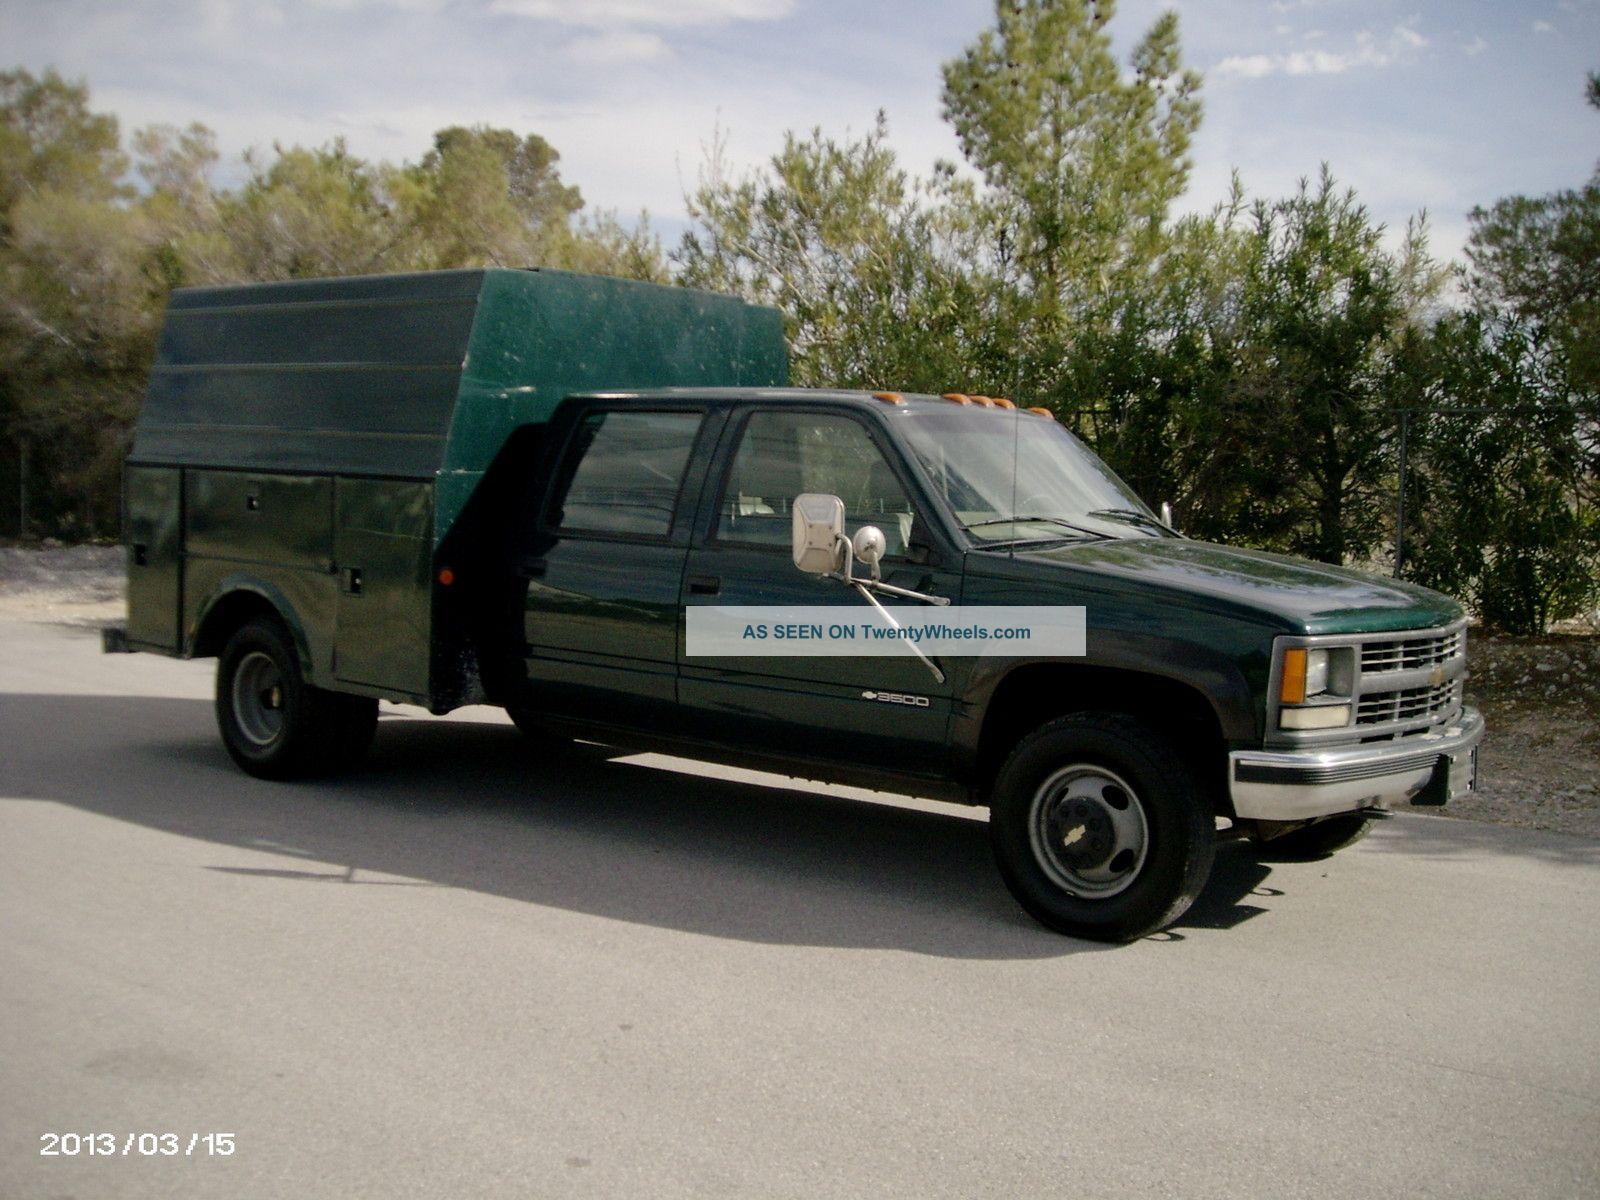 2000 Chevrolet 3500 Dually Utility / Service Trucks photo 2